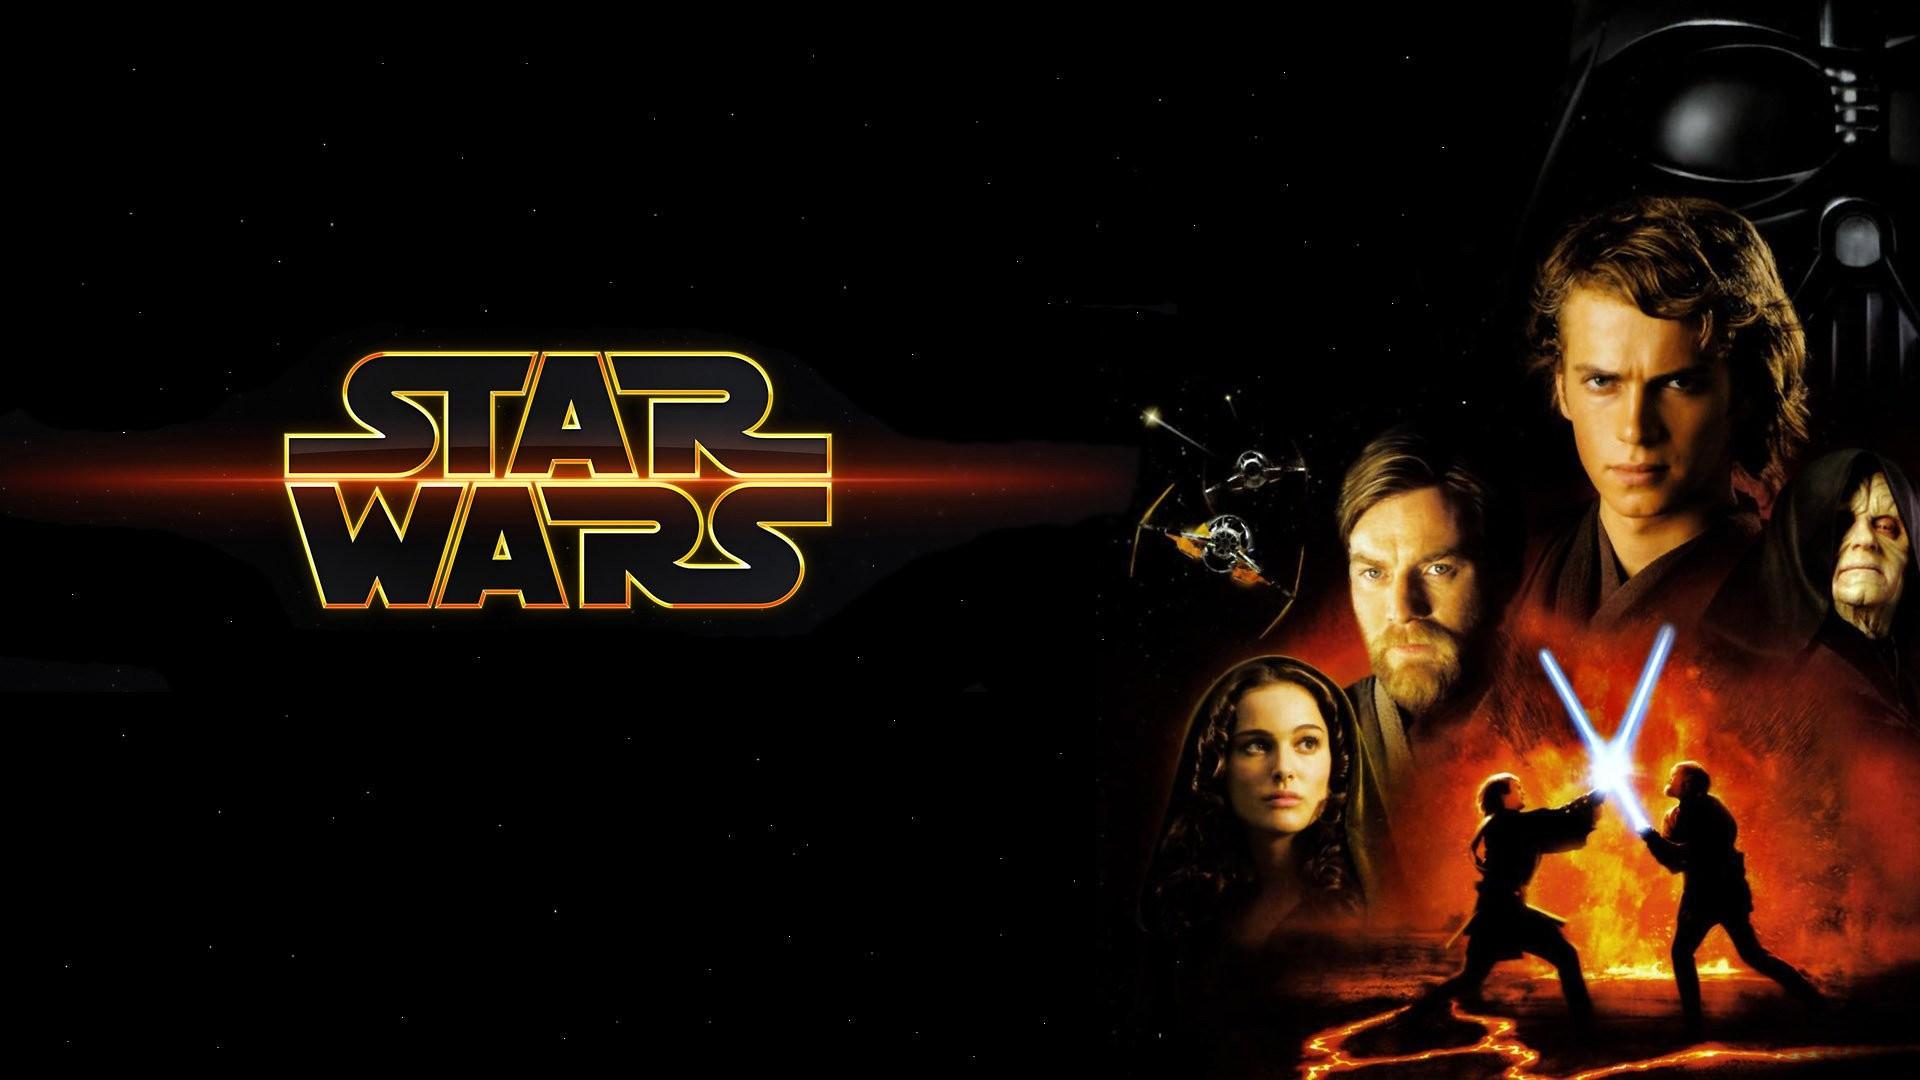 Obi-Wan Kenobi · Padmé Amidala · Movie – Star Wars Episode III: Revenge of  the Sith Padmé Amidala Darth Vader Anakin